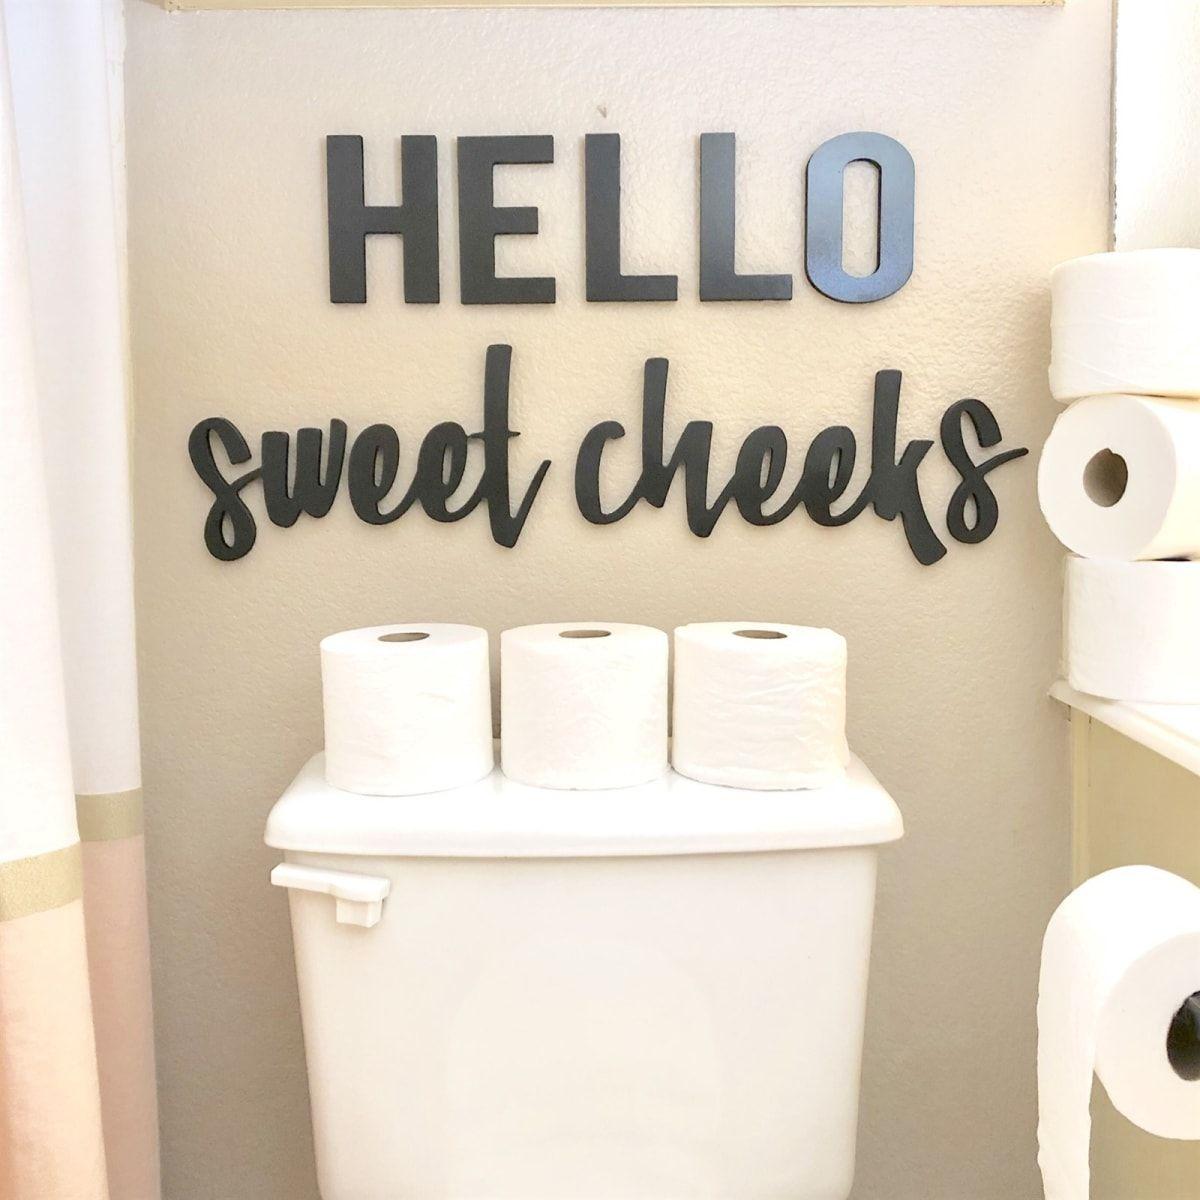 Funny Bathroom Signs in 2020 | Bathroom humor, Bathroom ...